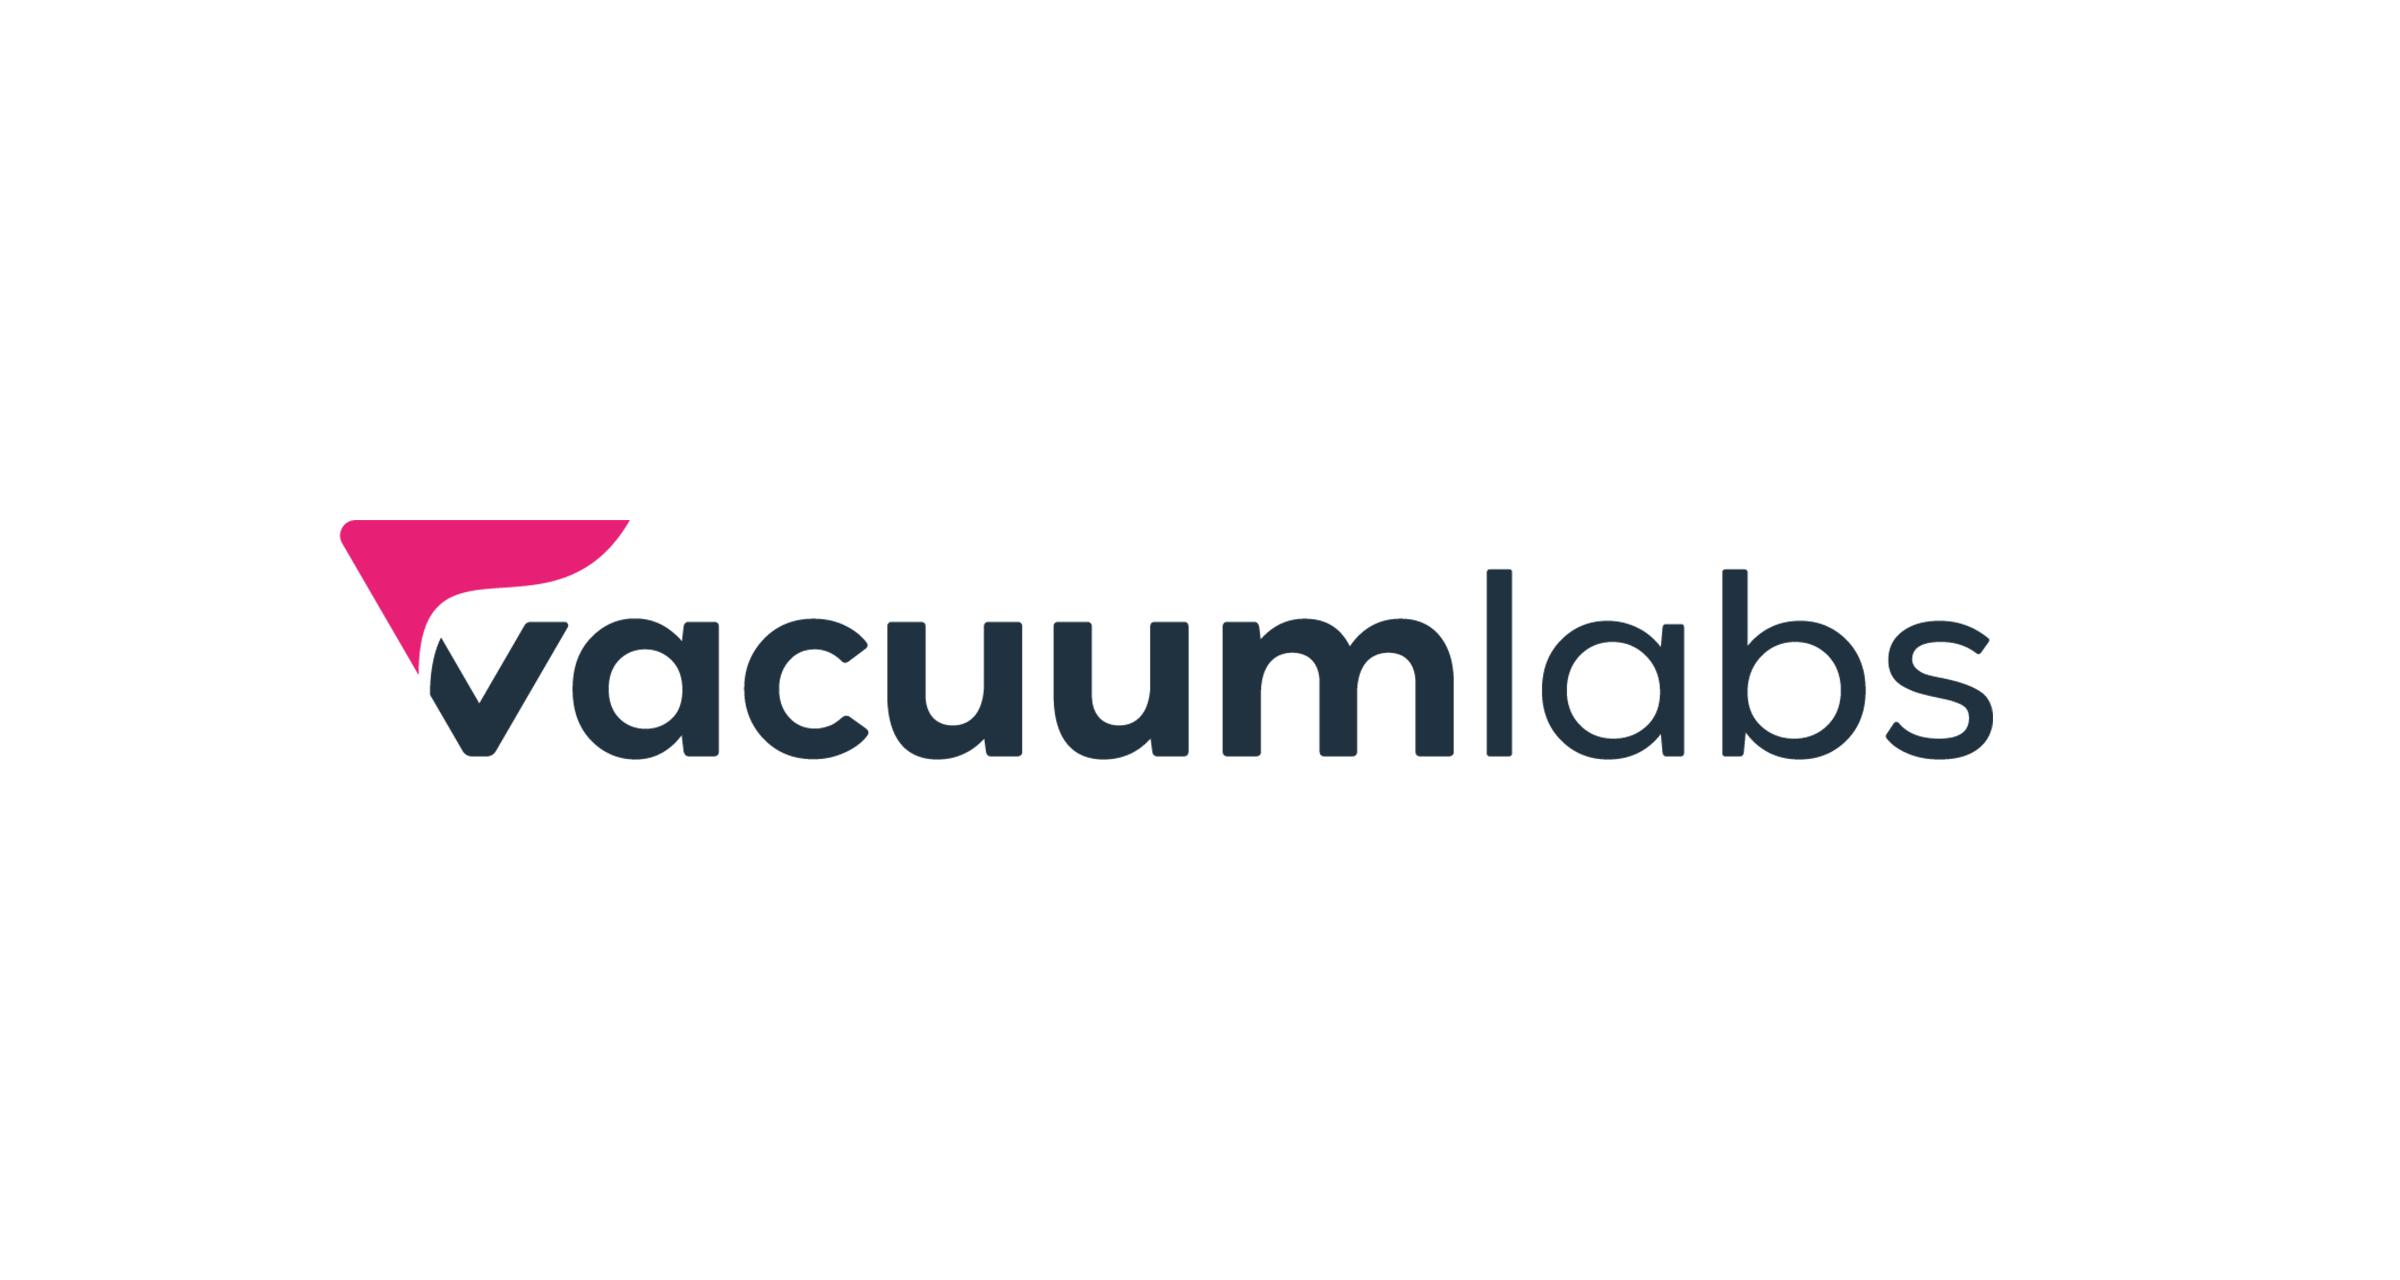 Vacuumlabs Launches New Regional Headquarters in Hong Kong